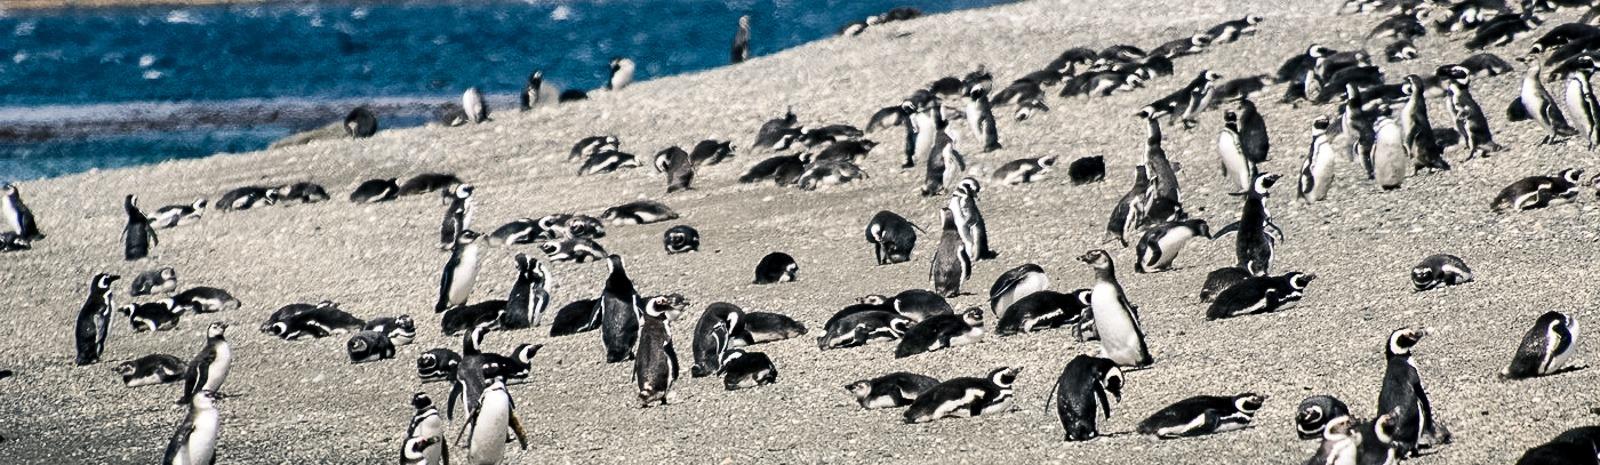 pinguinos-2